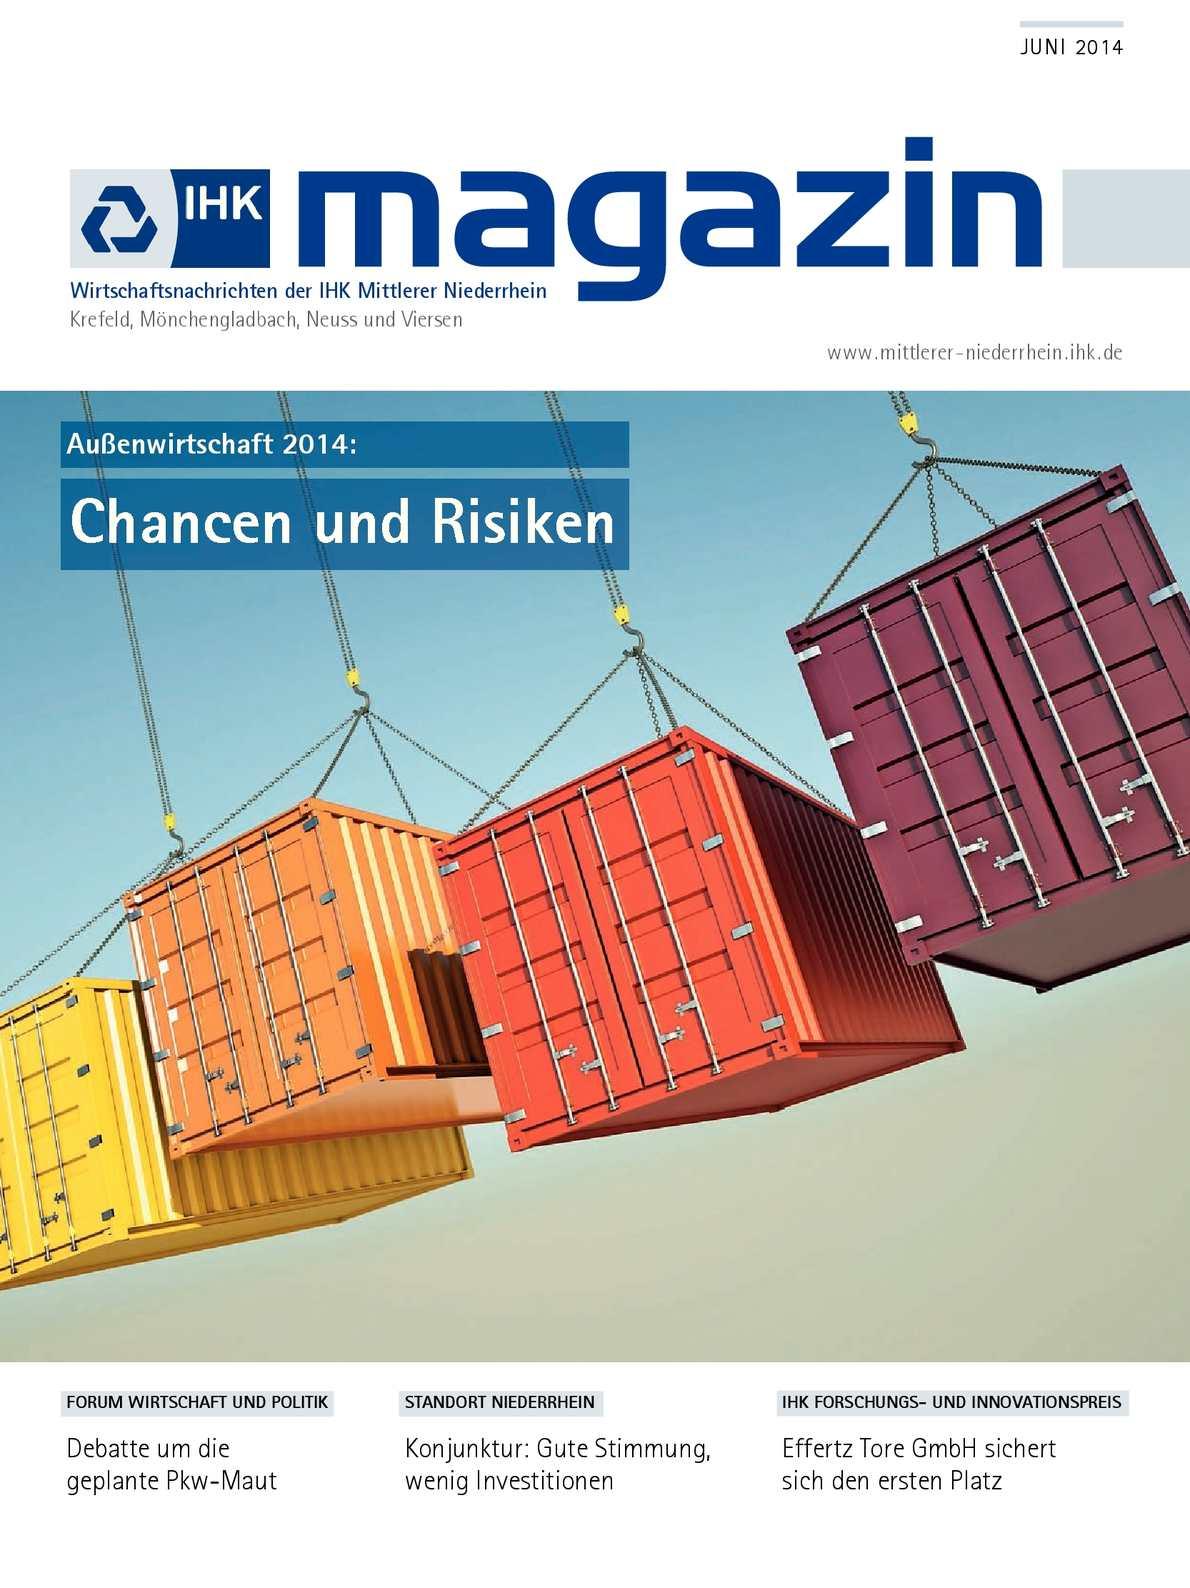 Calaméo - IHK Magazin Juni 2014